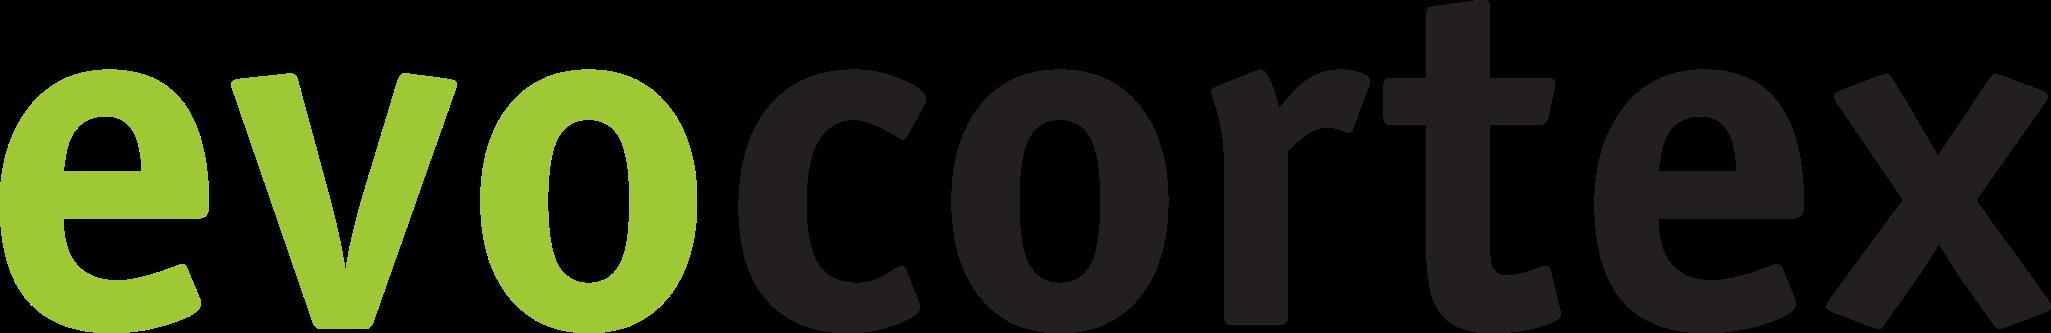 Evocortex GmbH